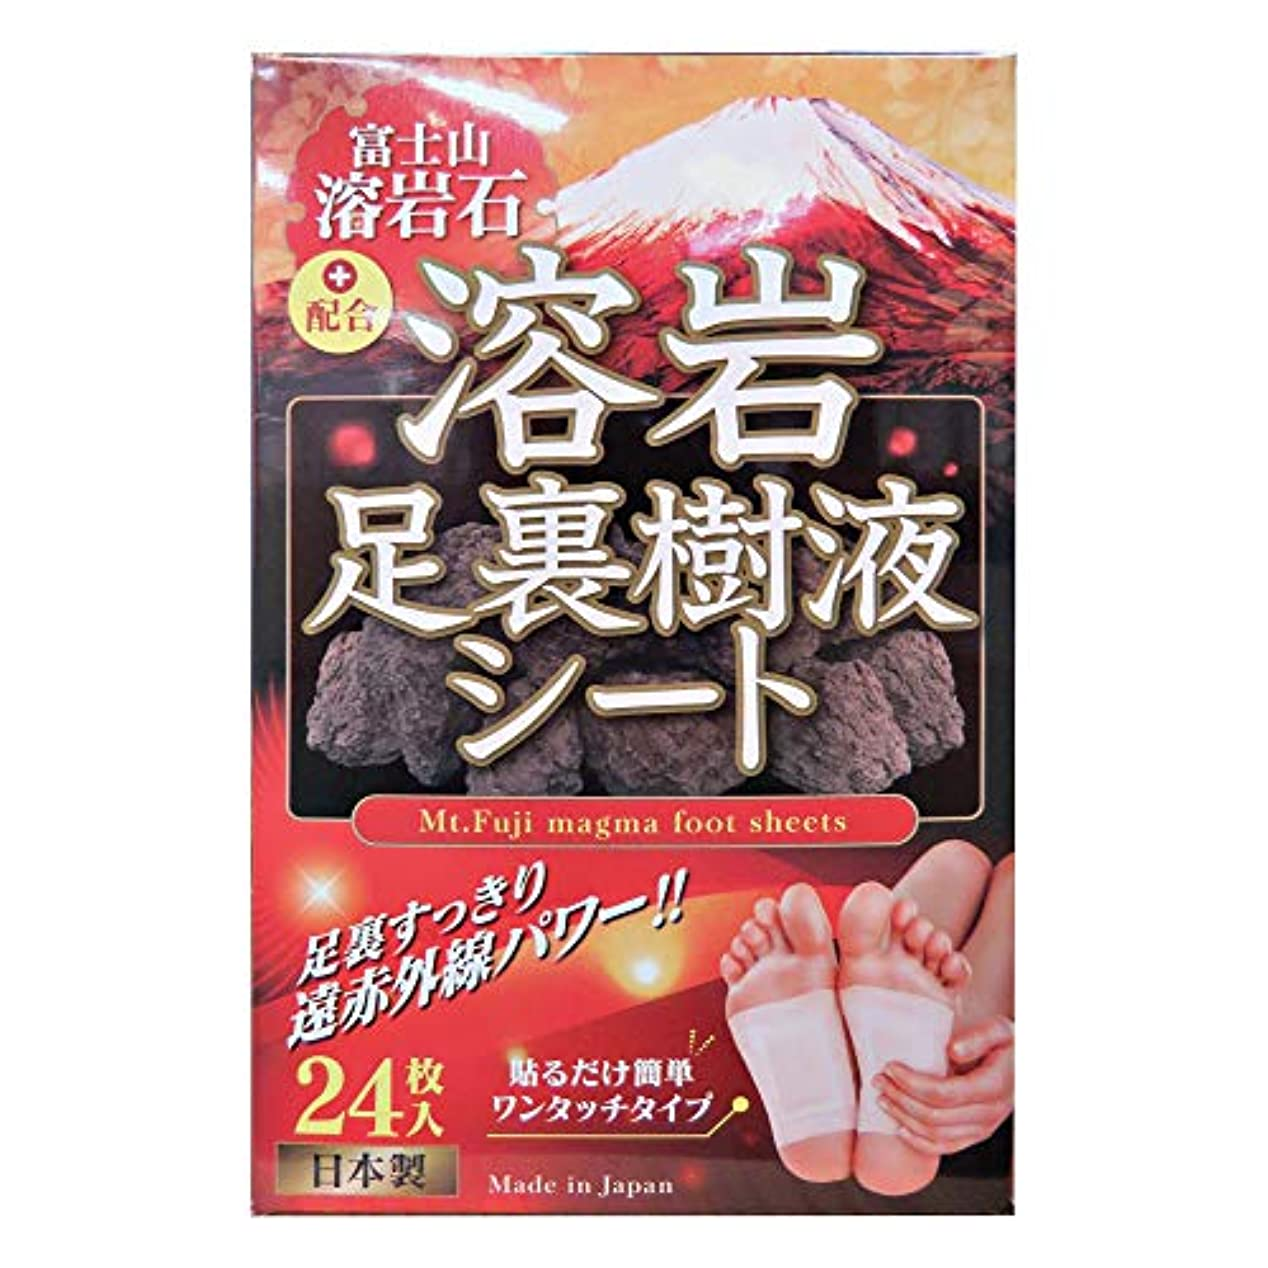 融合参加者廃棄する富士山溶岩石配合 溶岩足裏樹液シート(24枚)